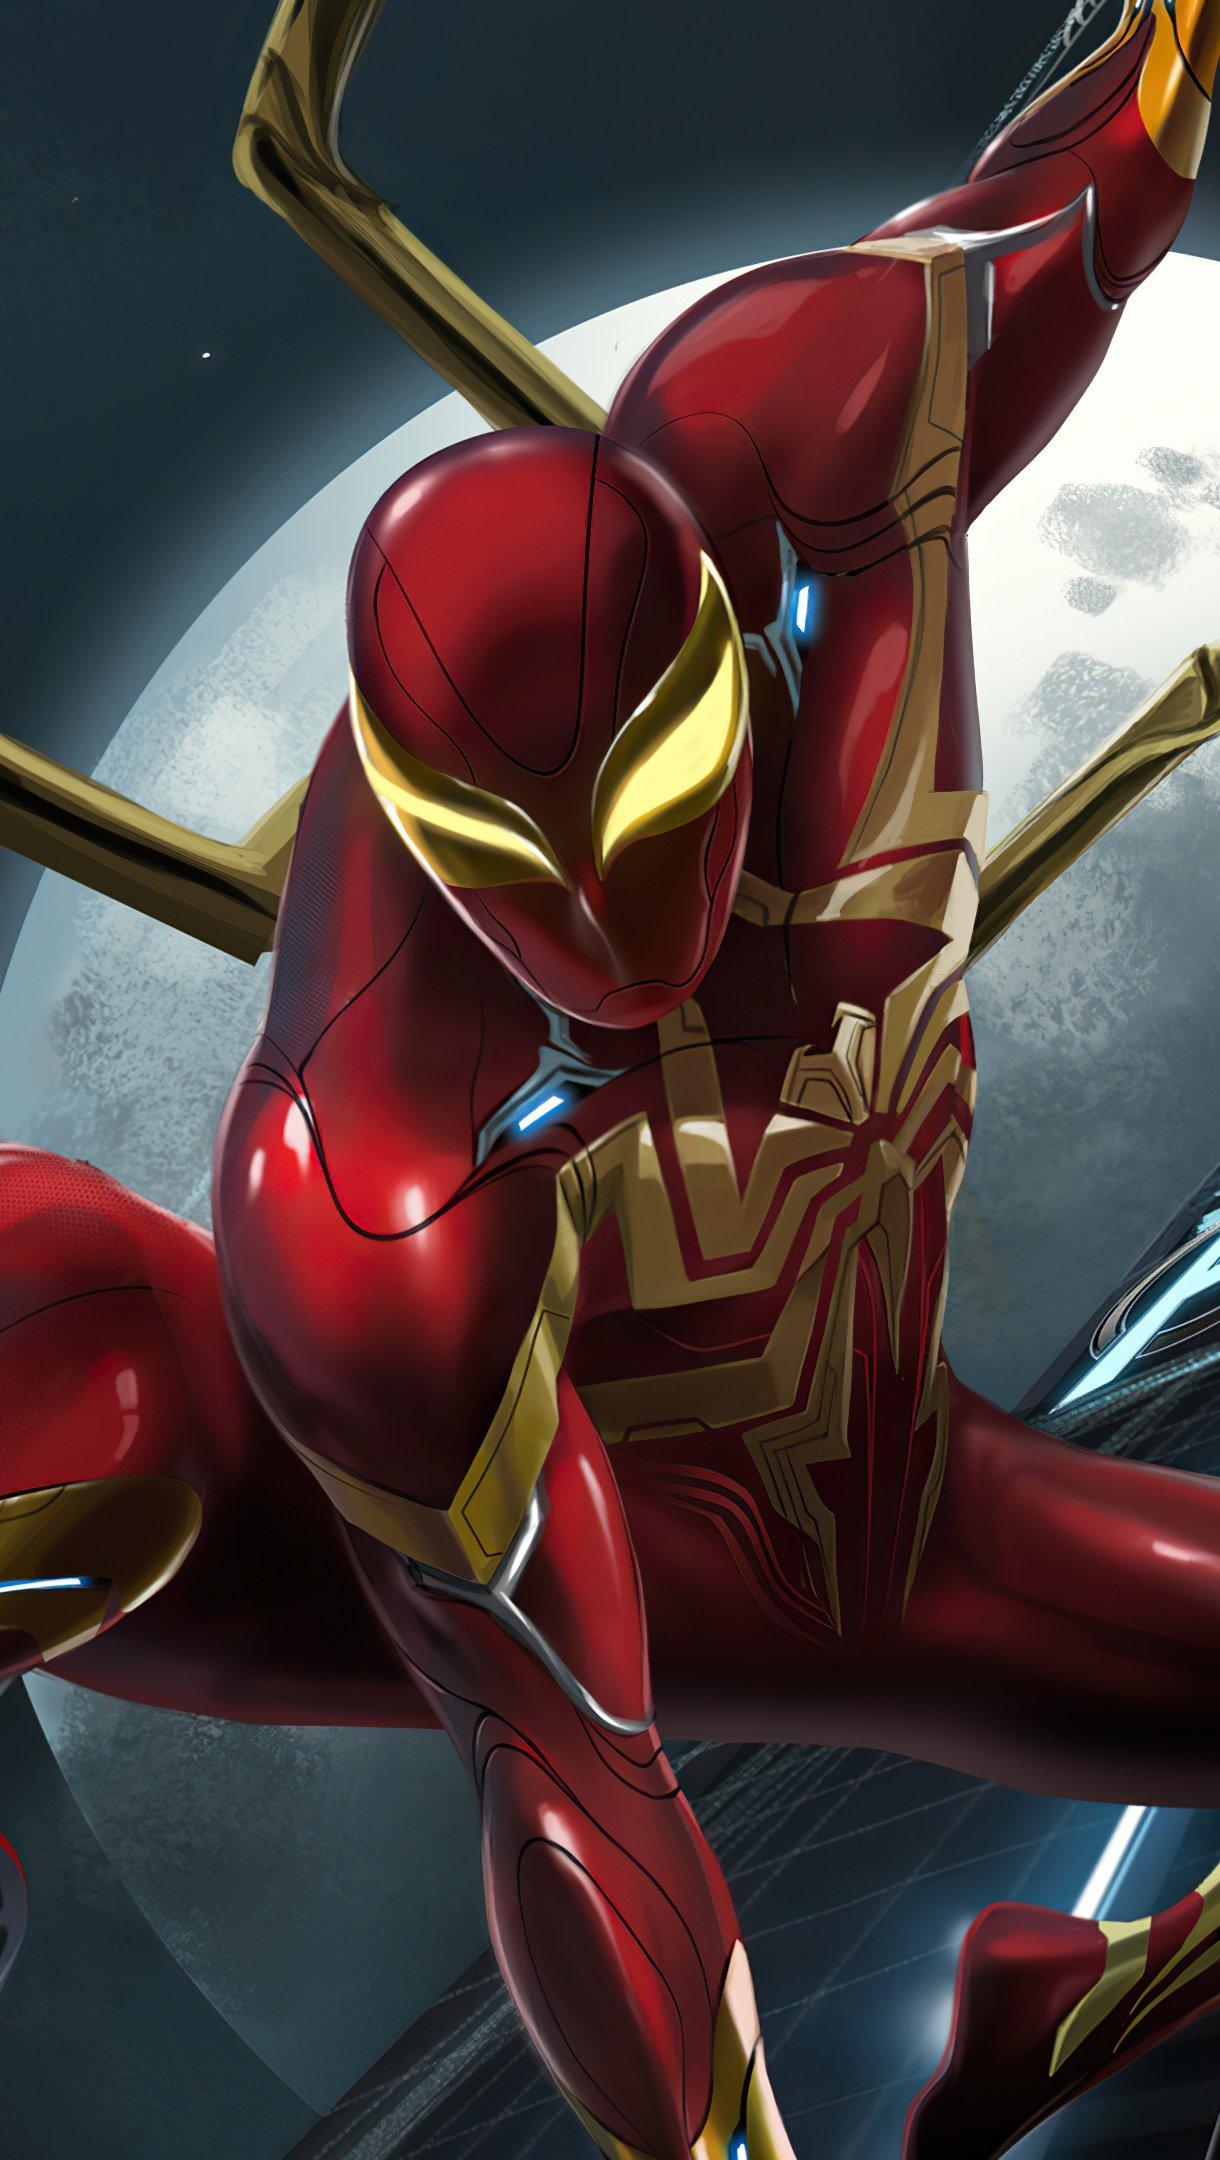 Fondos de pantalla Peter Parker Iron Spider Vertical